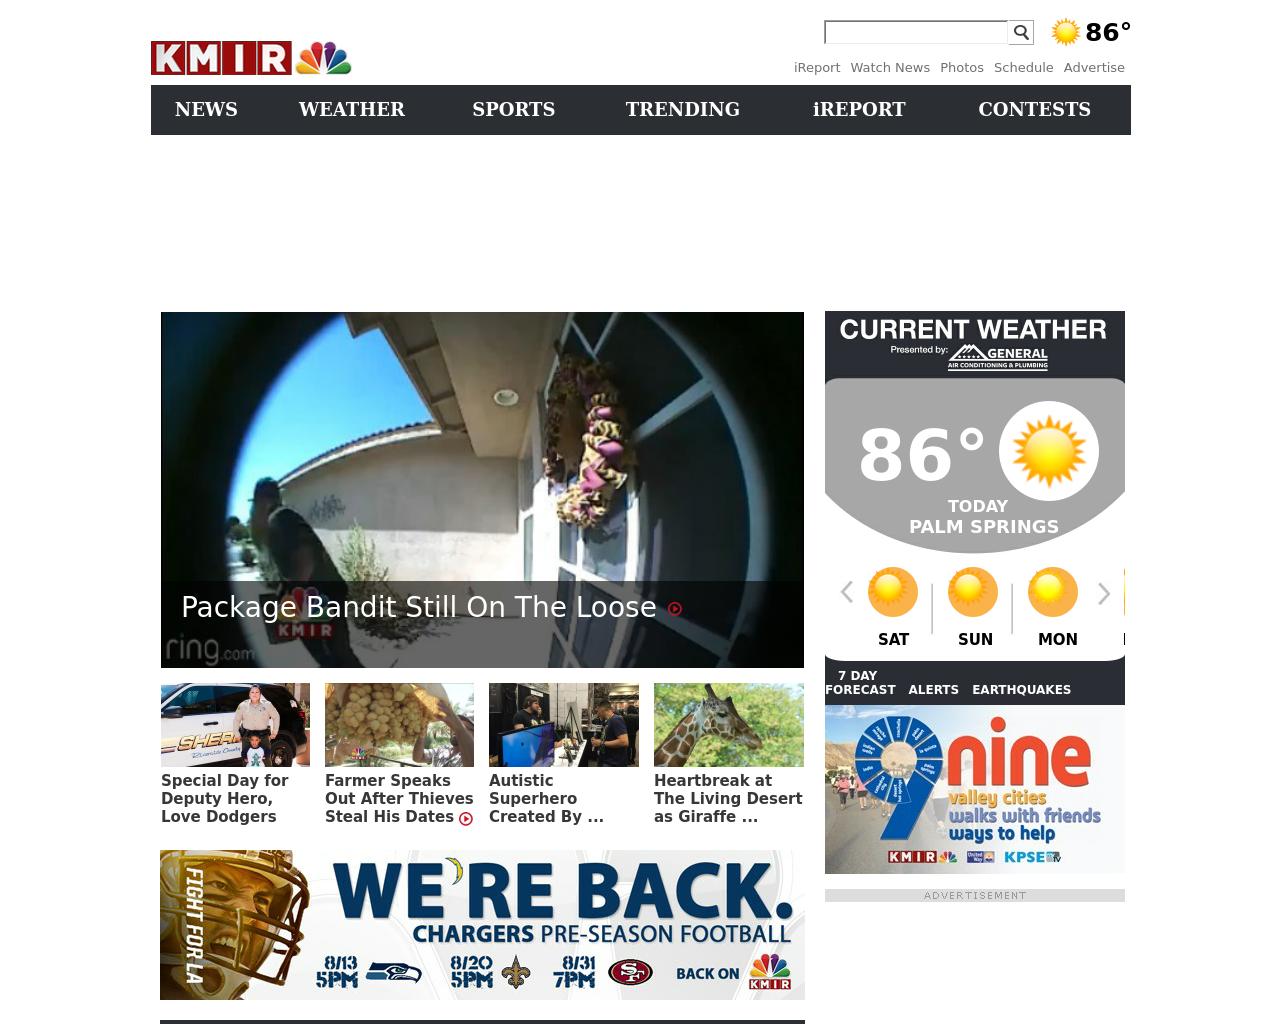 KMIR-News-Advertising-Reviews-Pricing